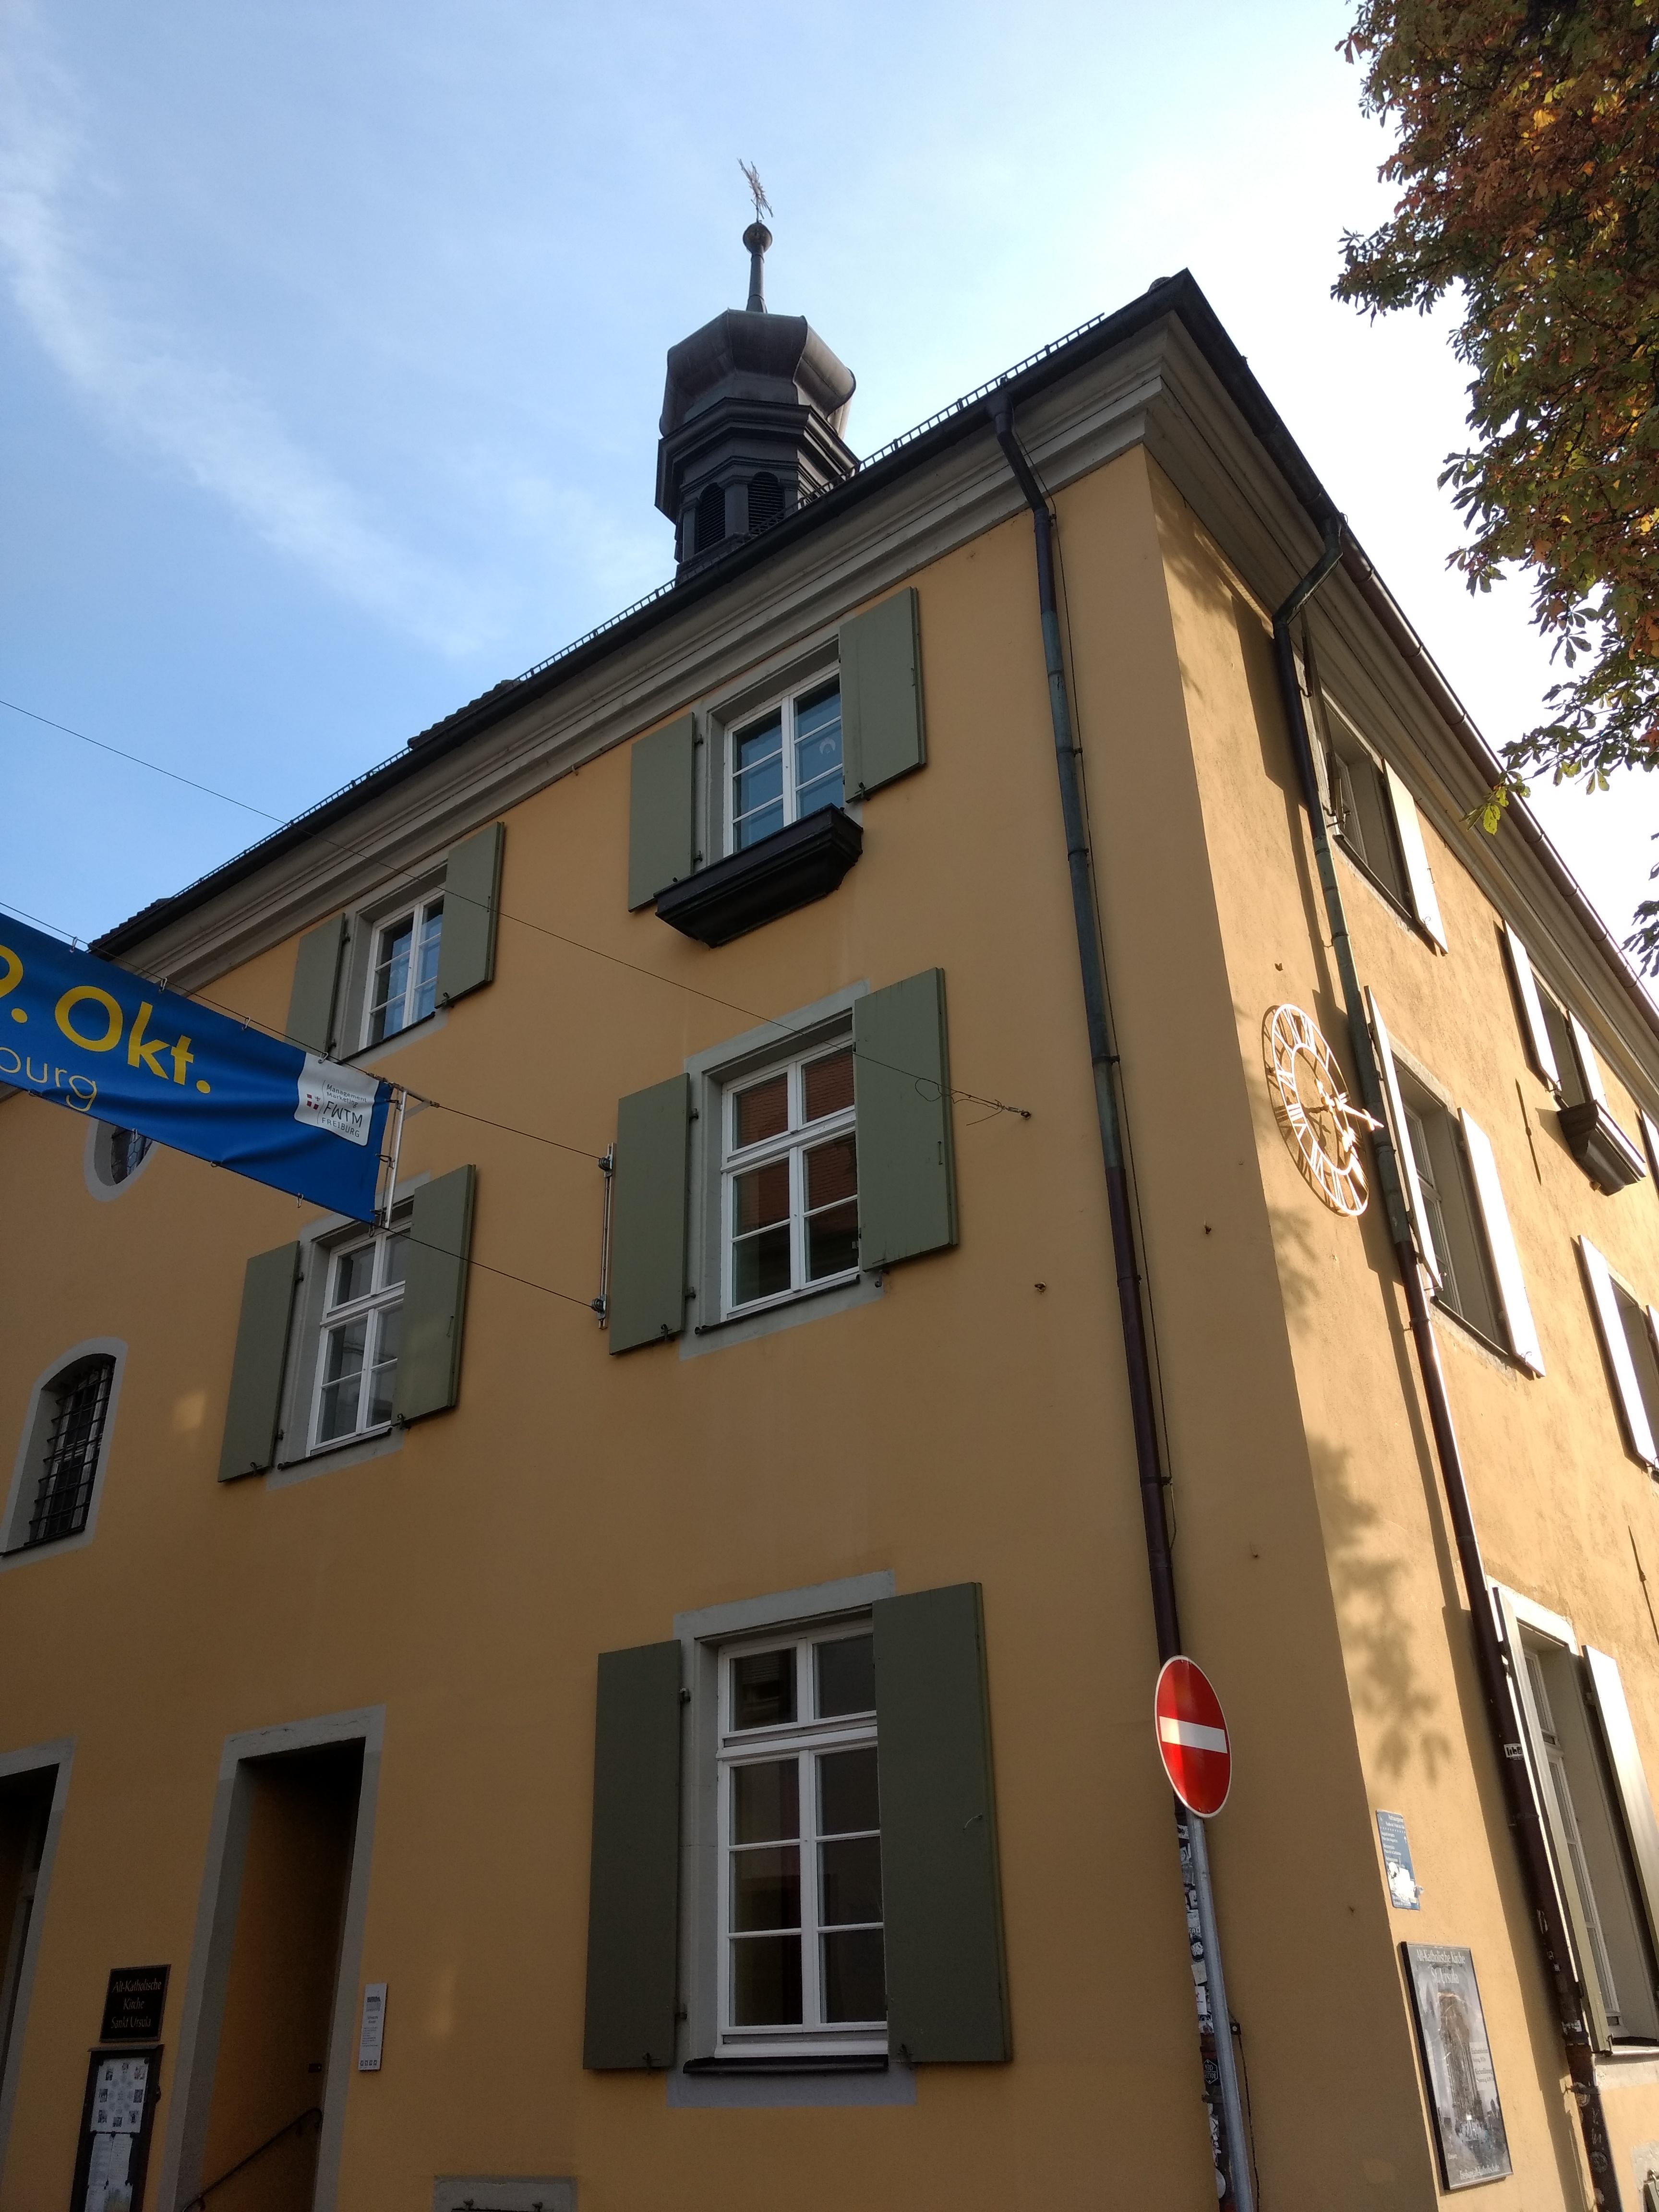 Freiburg ursula 4.jpg